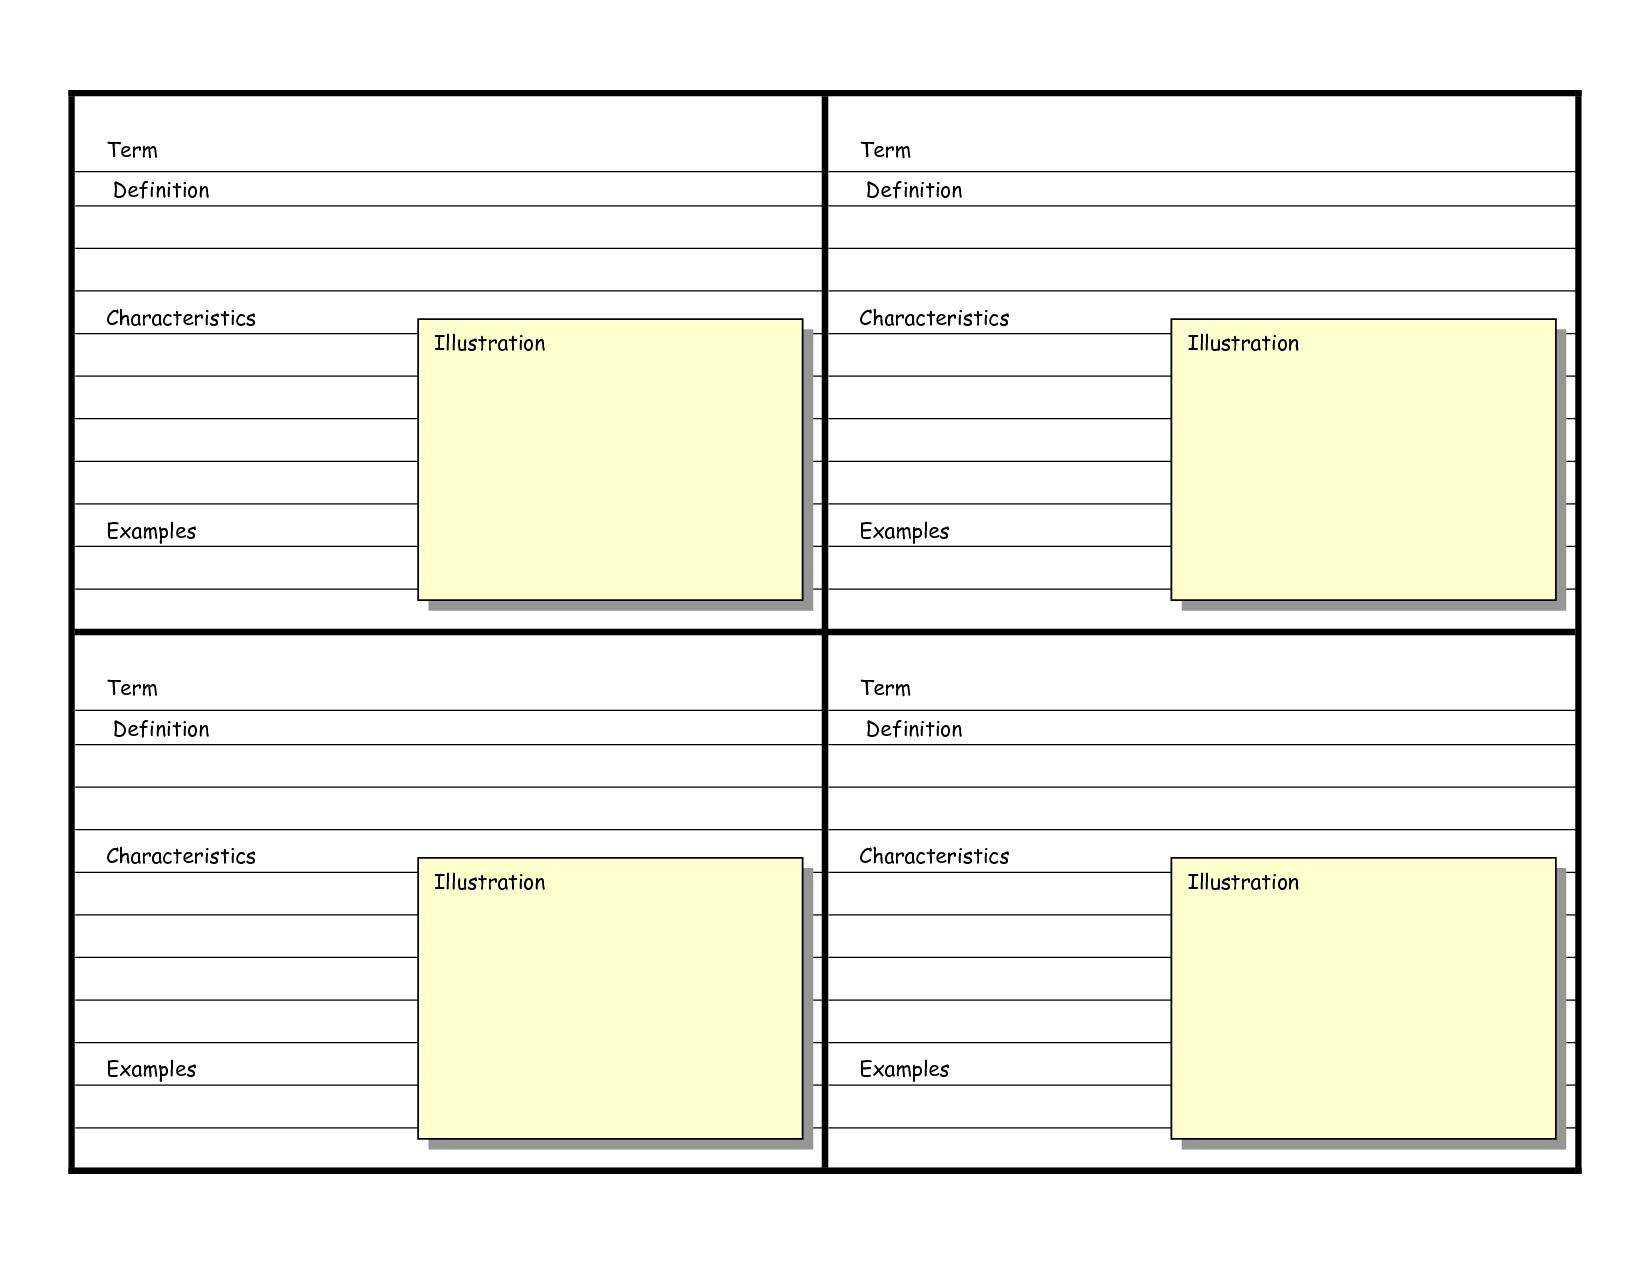 031 Template Ideas Baseball Card Beautiful Word Size Trading Within Baseball Card Size Template